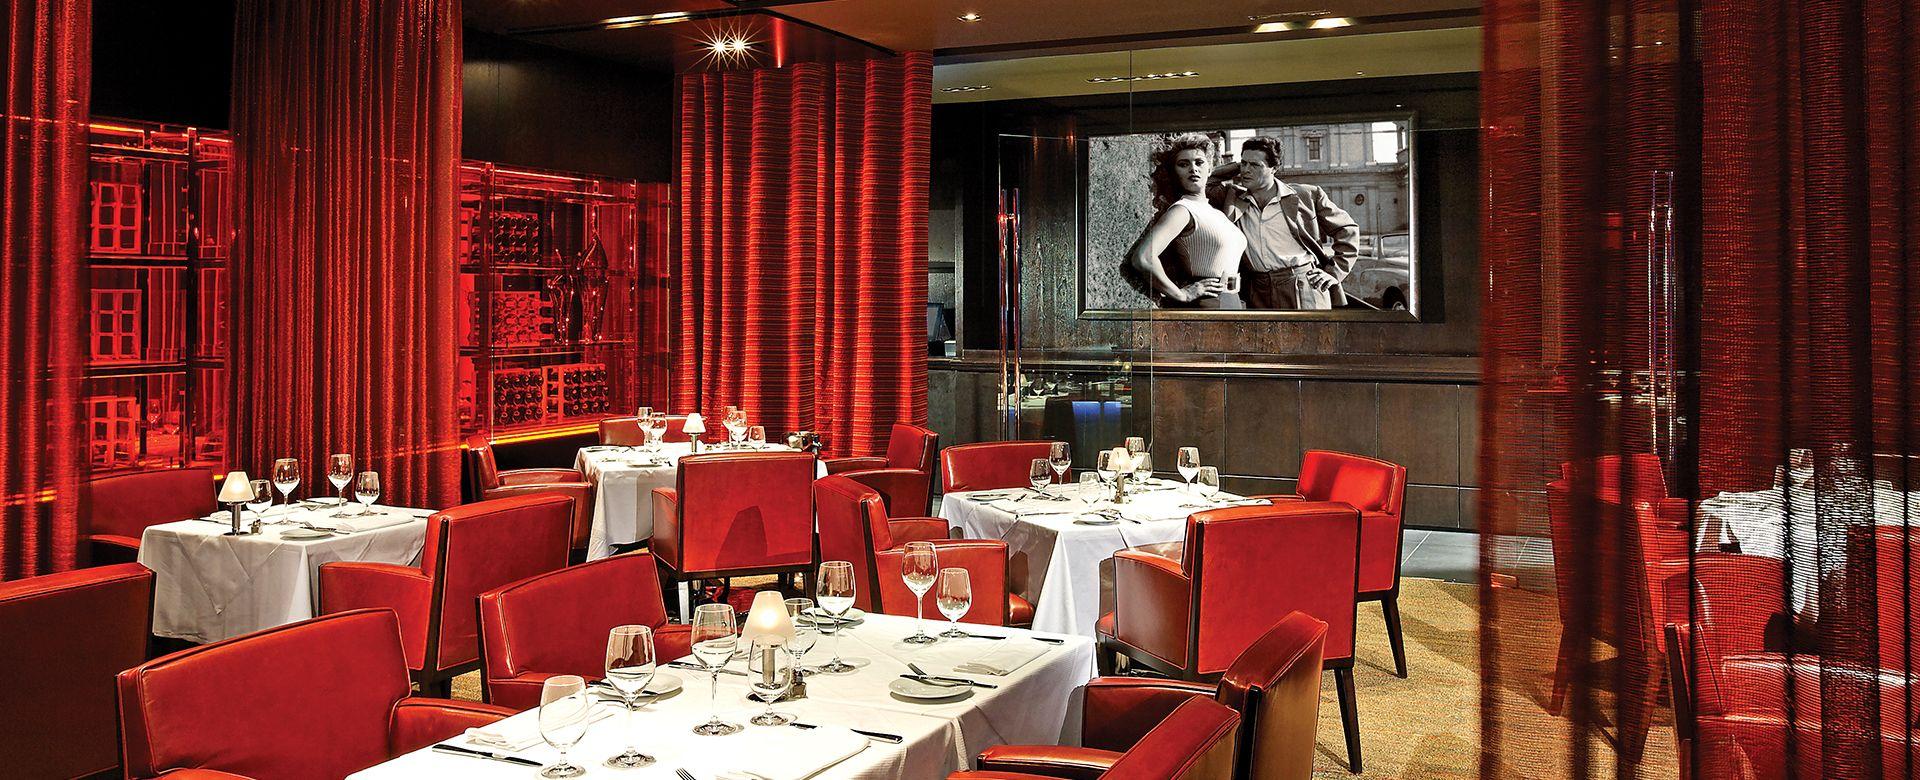 Ponte Vecchio Fallsview Casino Resort Hospitality In 2020 Private Dining Room Bar Design Restaurant Private Dining